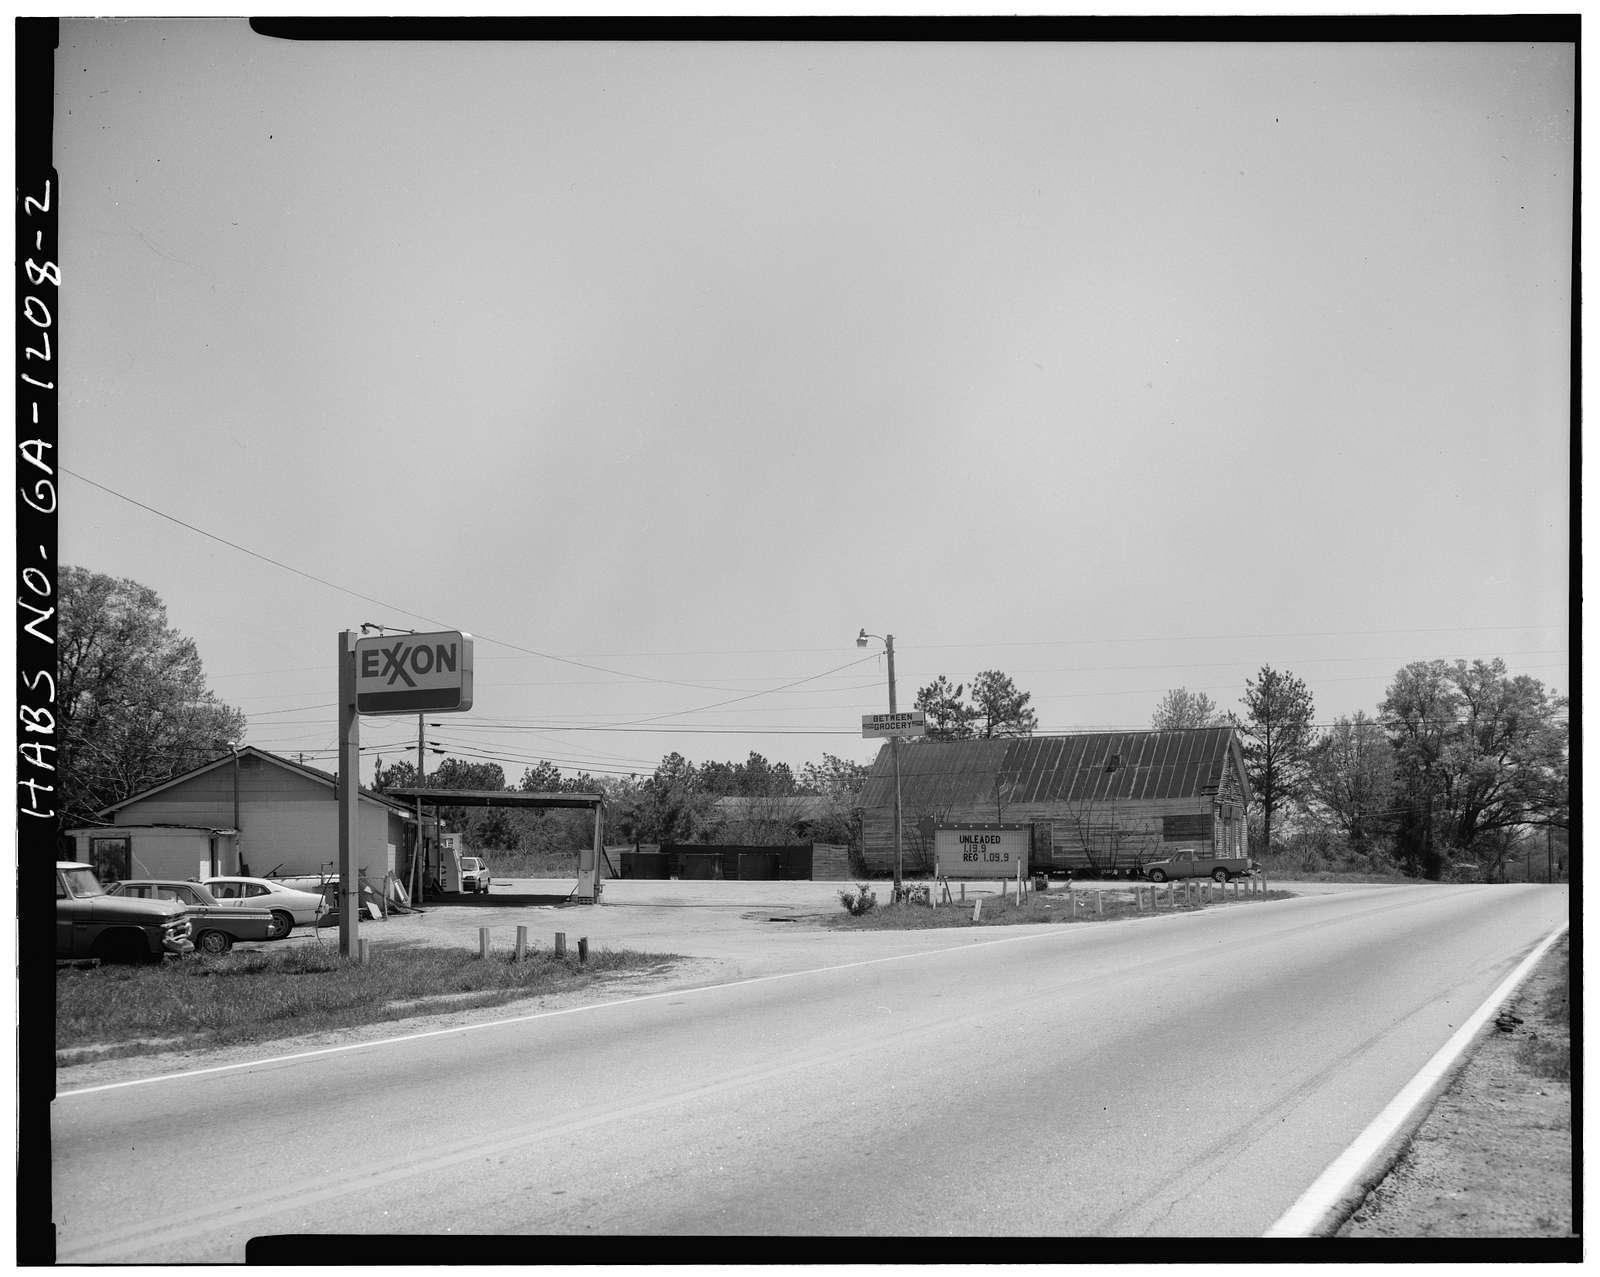 Upshaw-Briscoe Store, U.S. Route 78 & County Road 56 (New Hope Church Road), Between, Walton County, GA